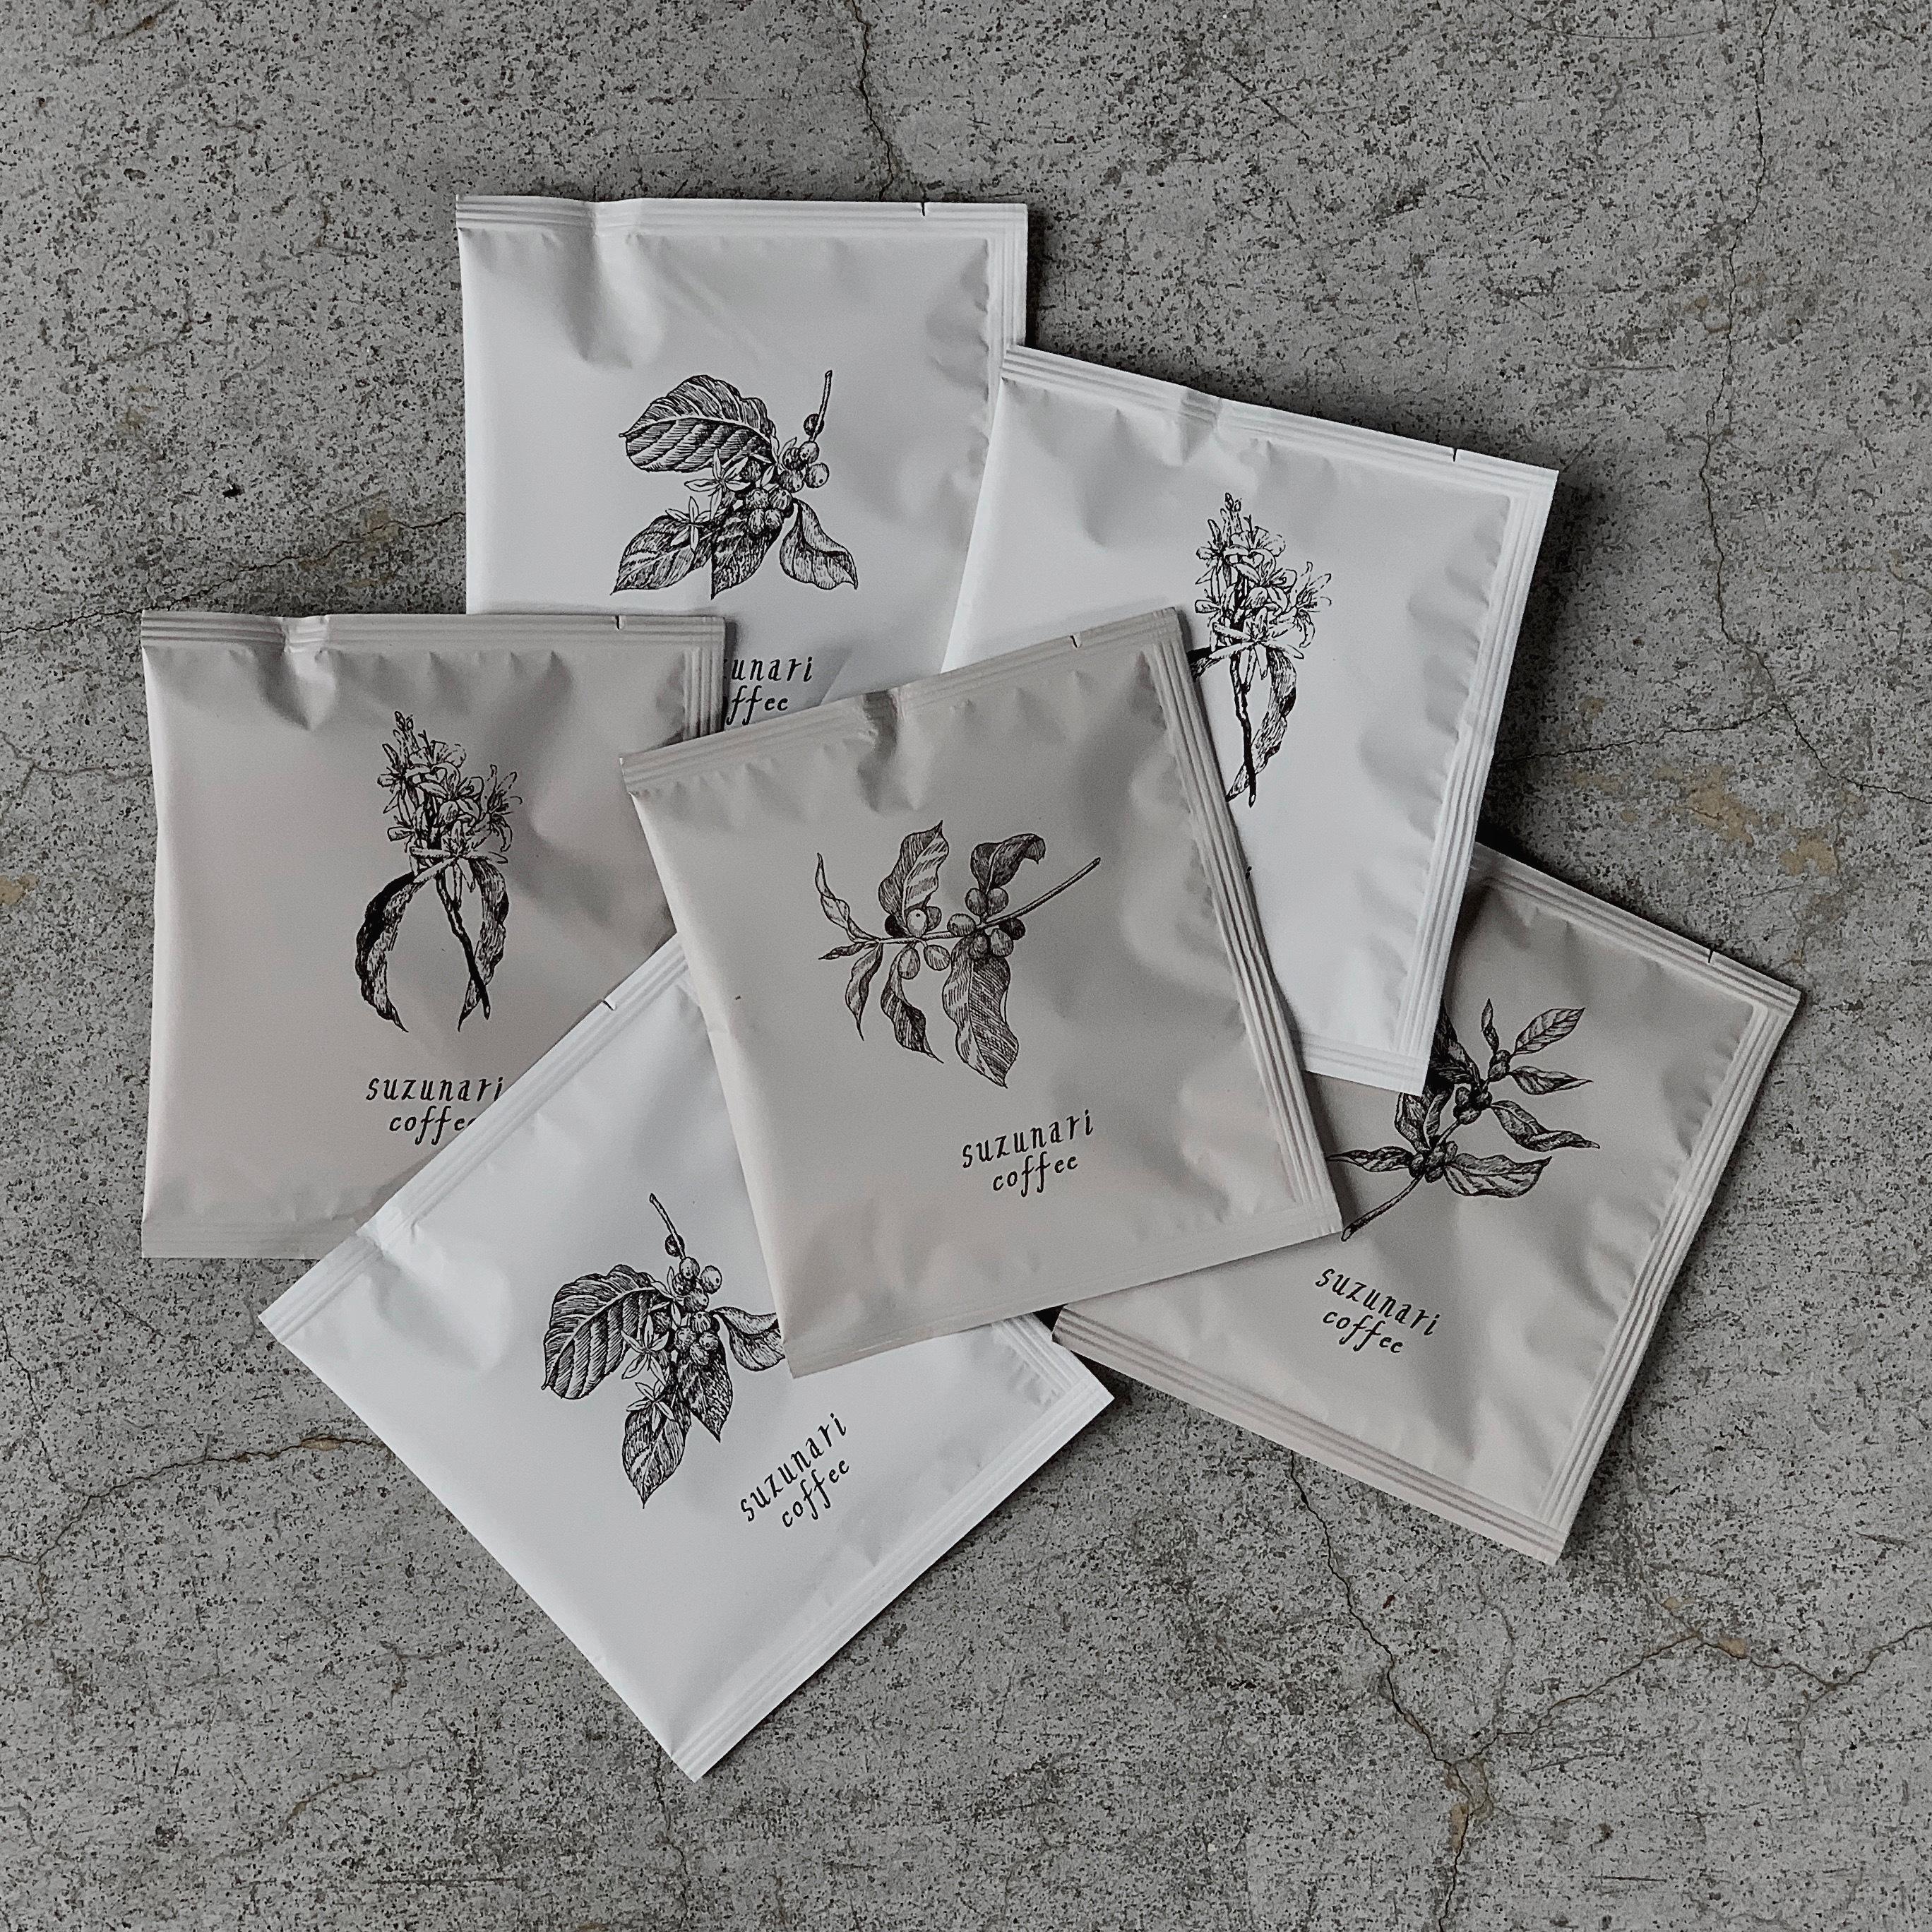 suzunari coffee Drip Bag